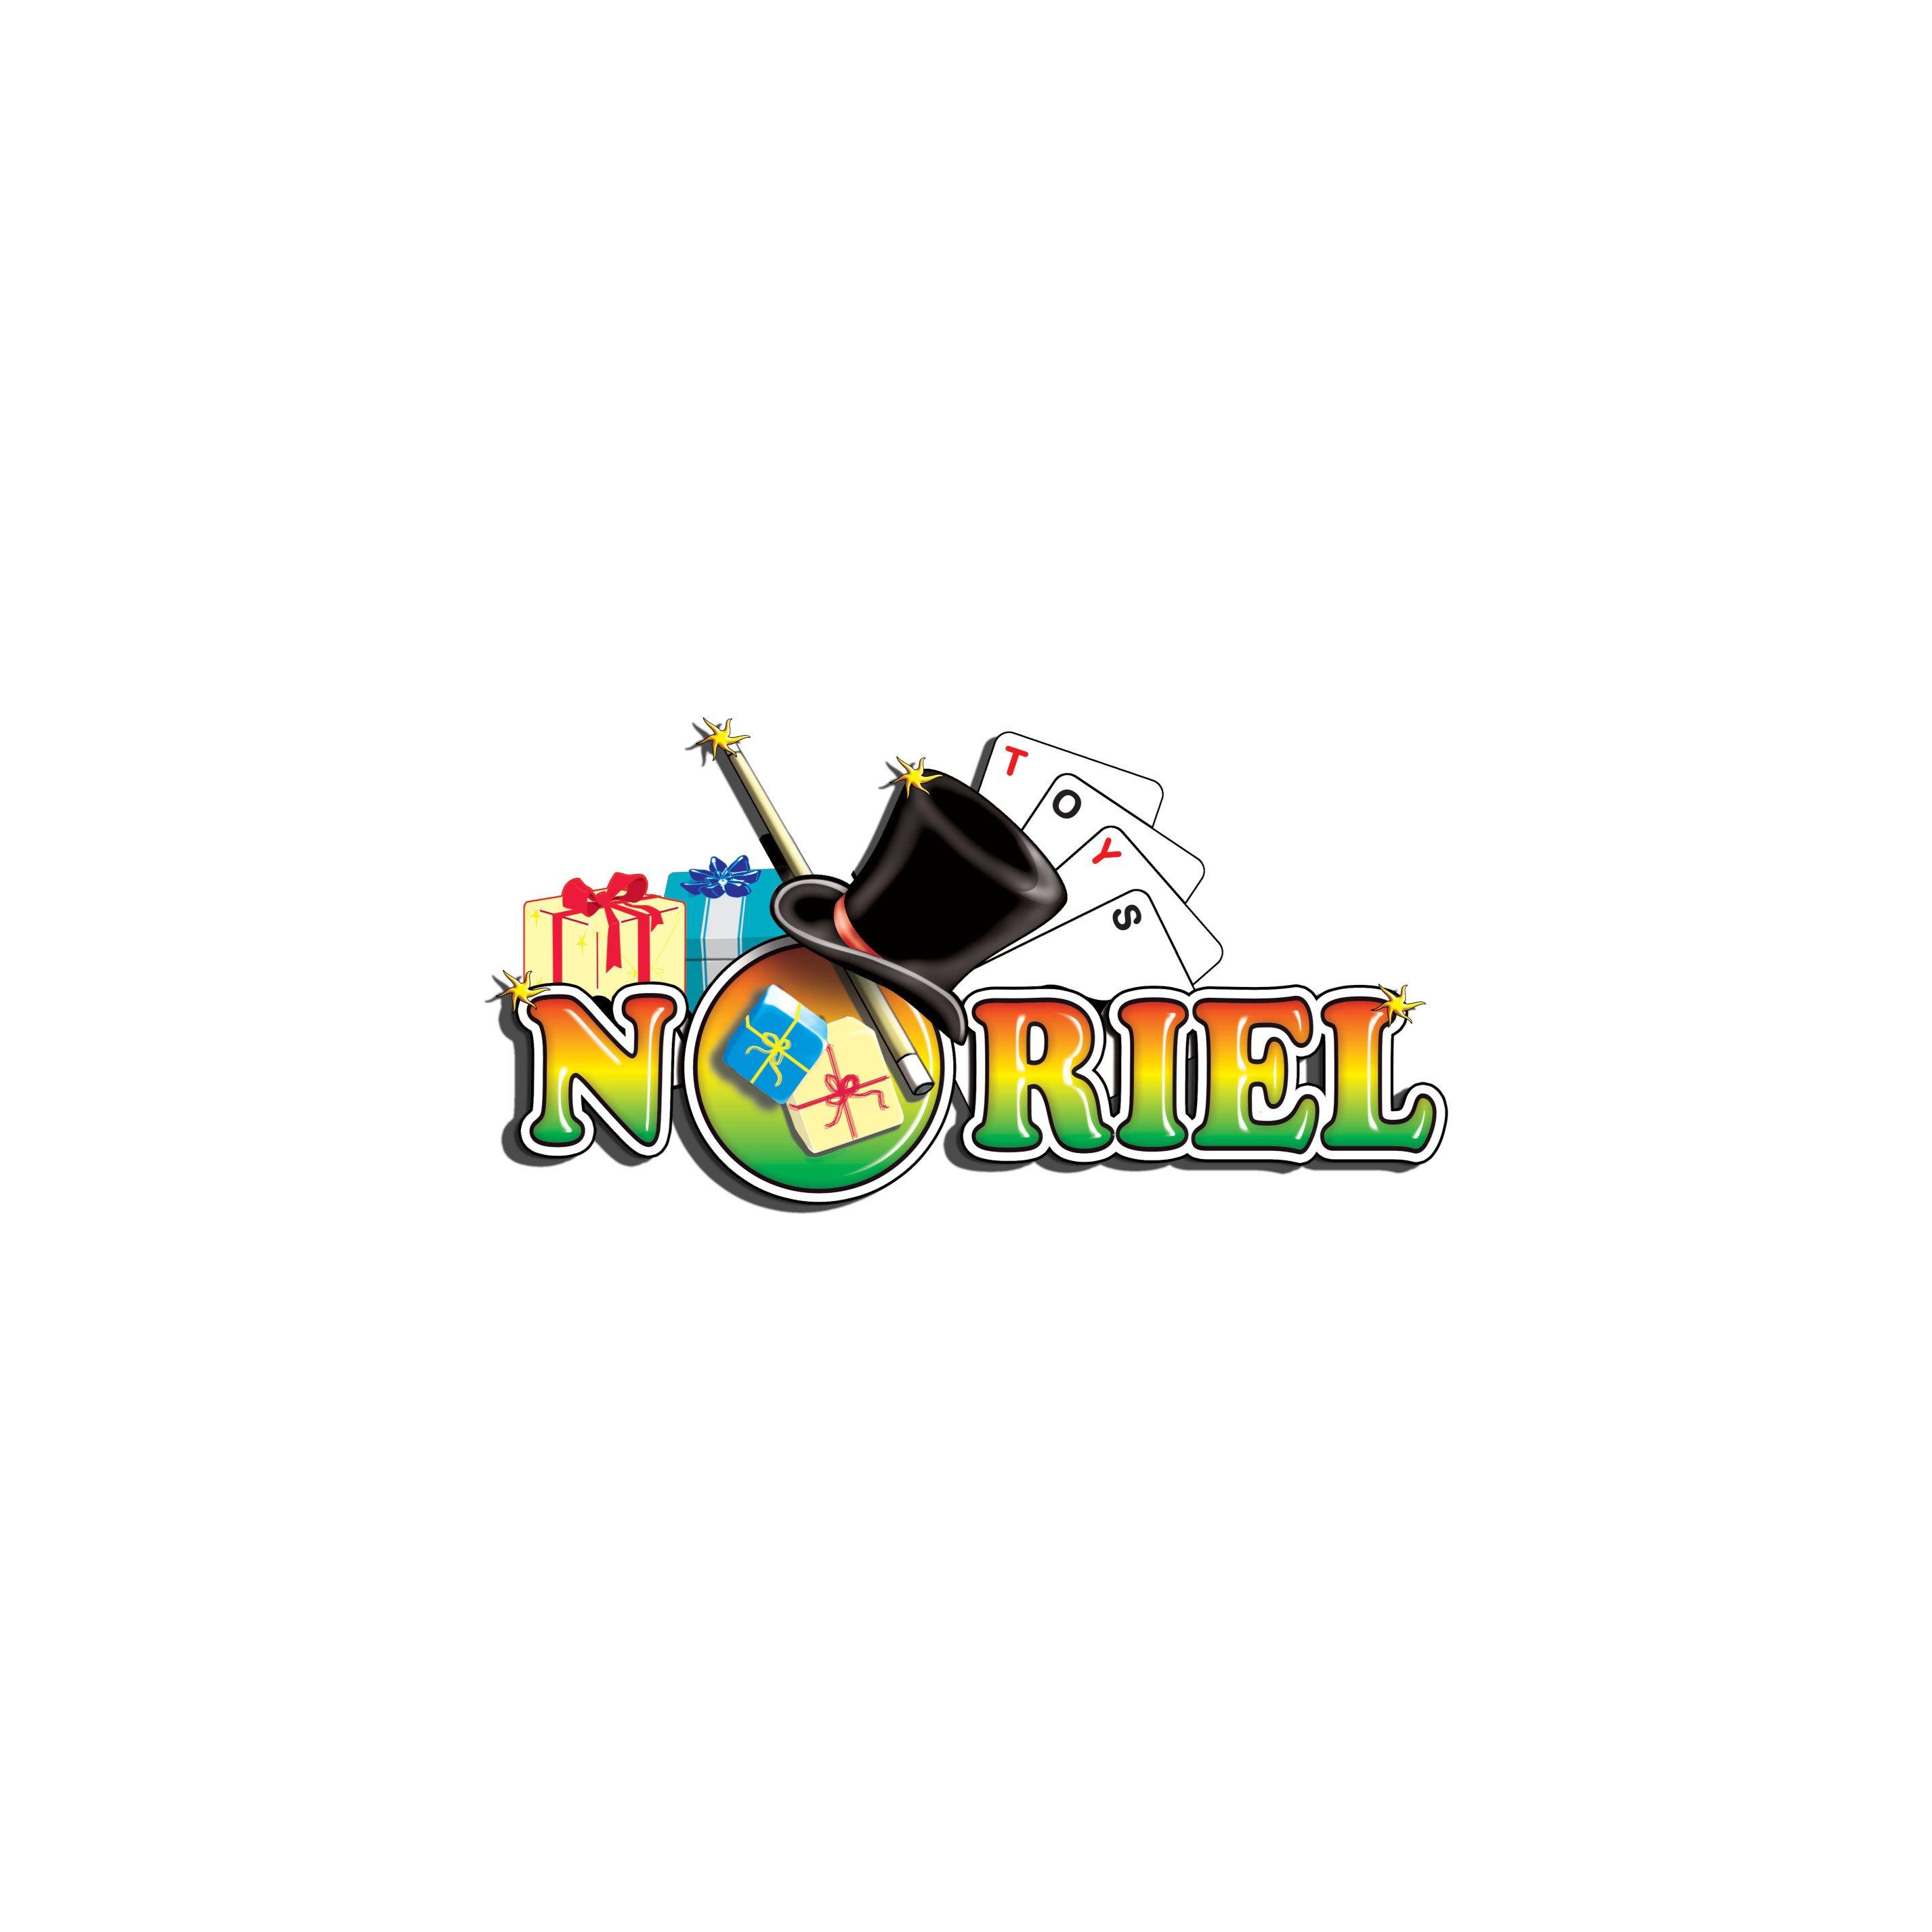 0180-GB01_001w Valiza pentru copii Ride-On Benny Pisica Trunki, Gri, 46 cm